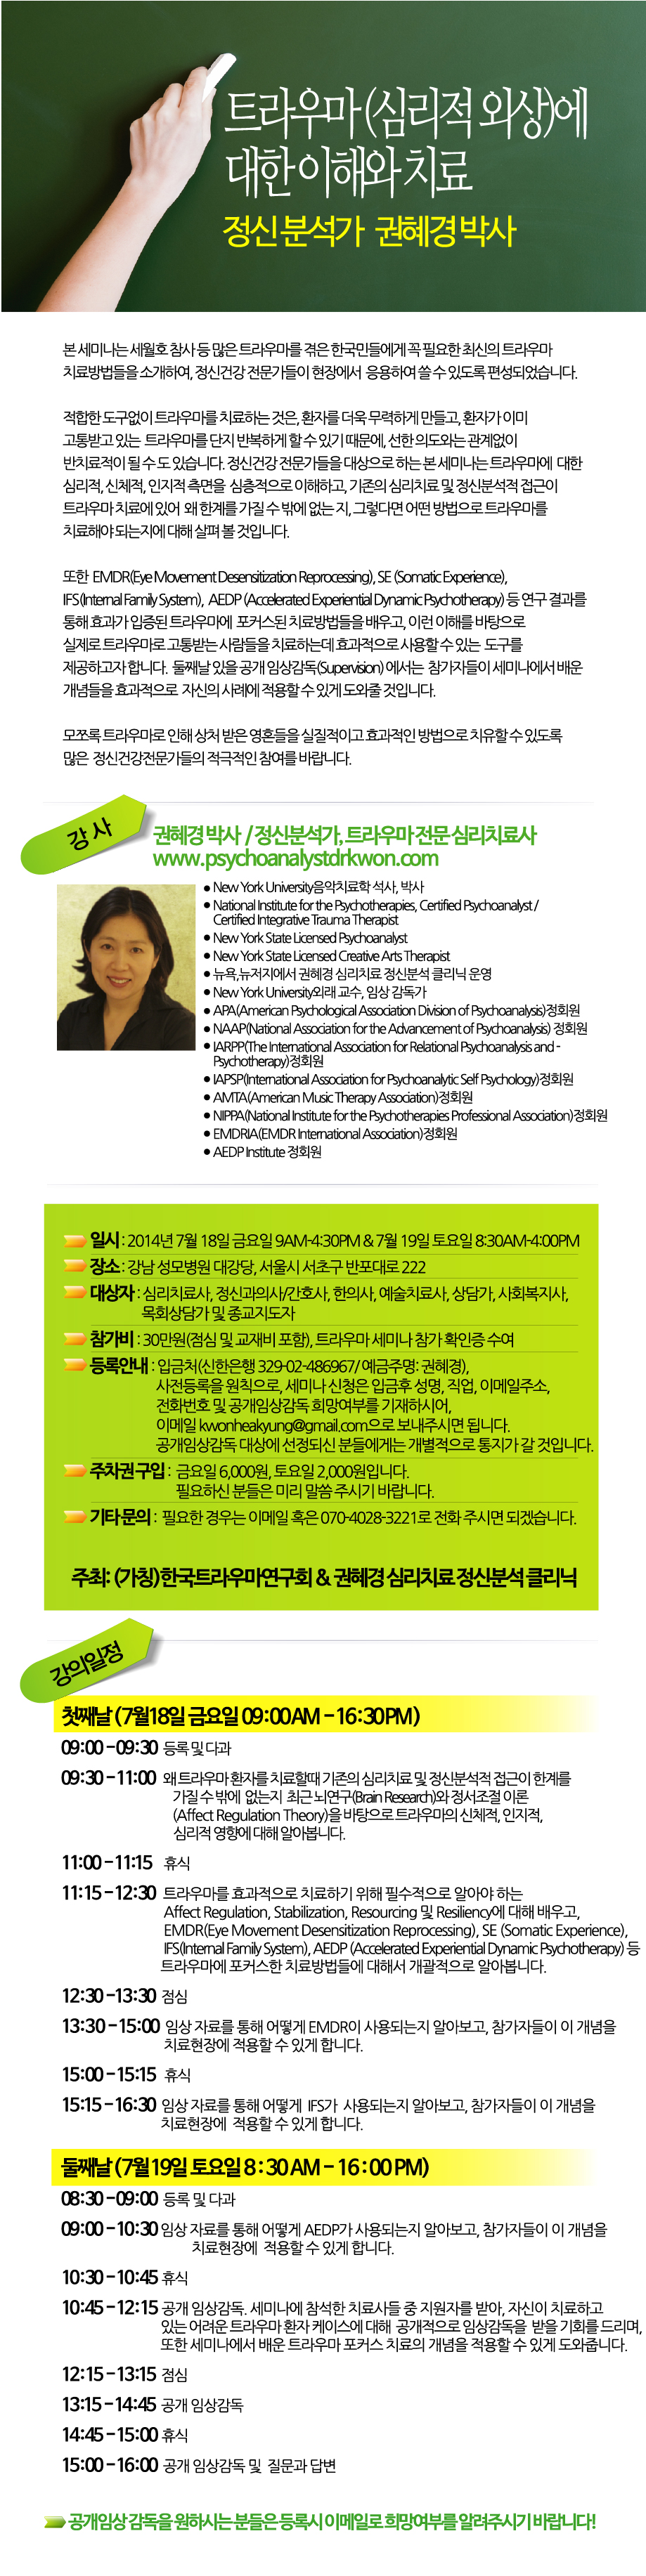 Integrative Trauma Seminar: Psychoanalyst Dr.Kwon Hea-Kyung/July 18 & 19 2014/St.Mary Hospital Grand Auditorium, Seoul, Korea